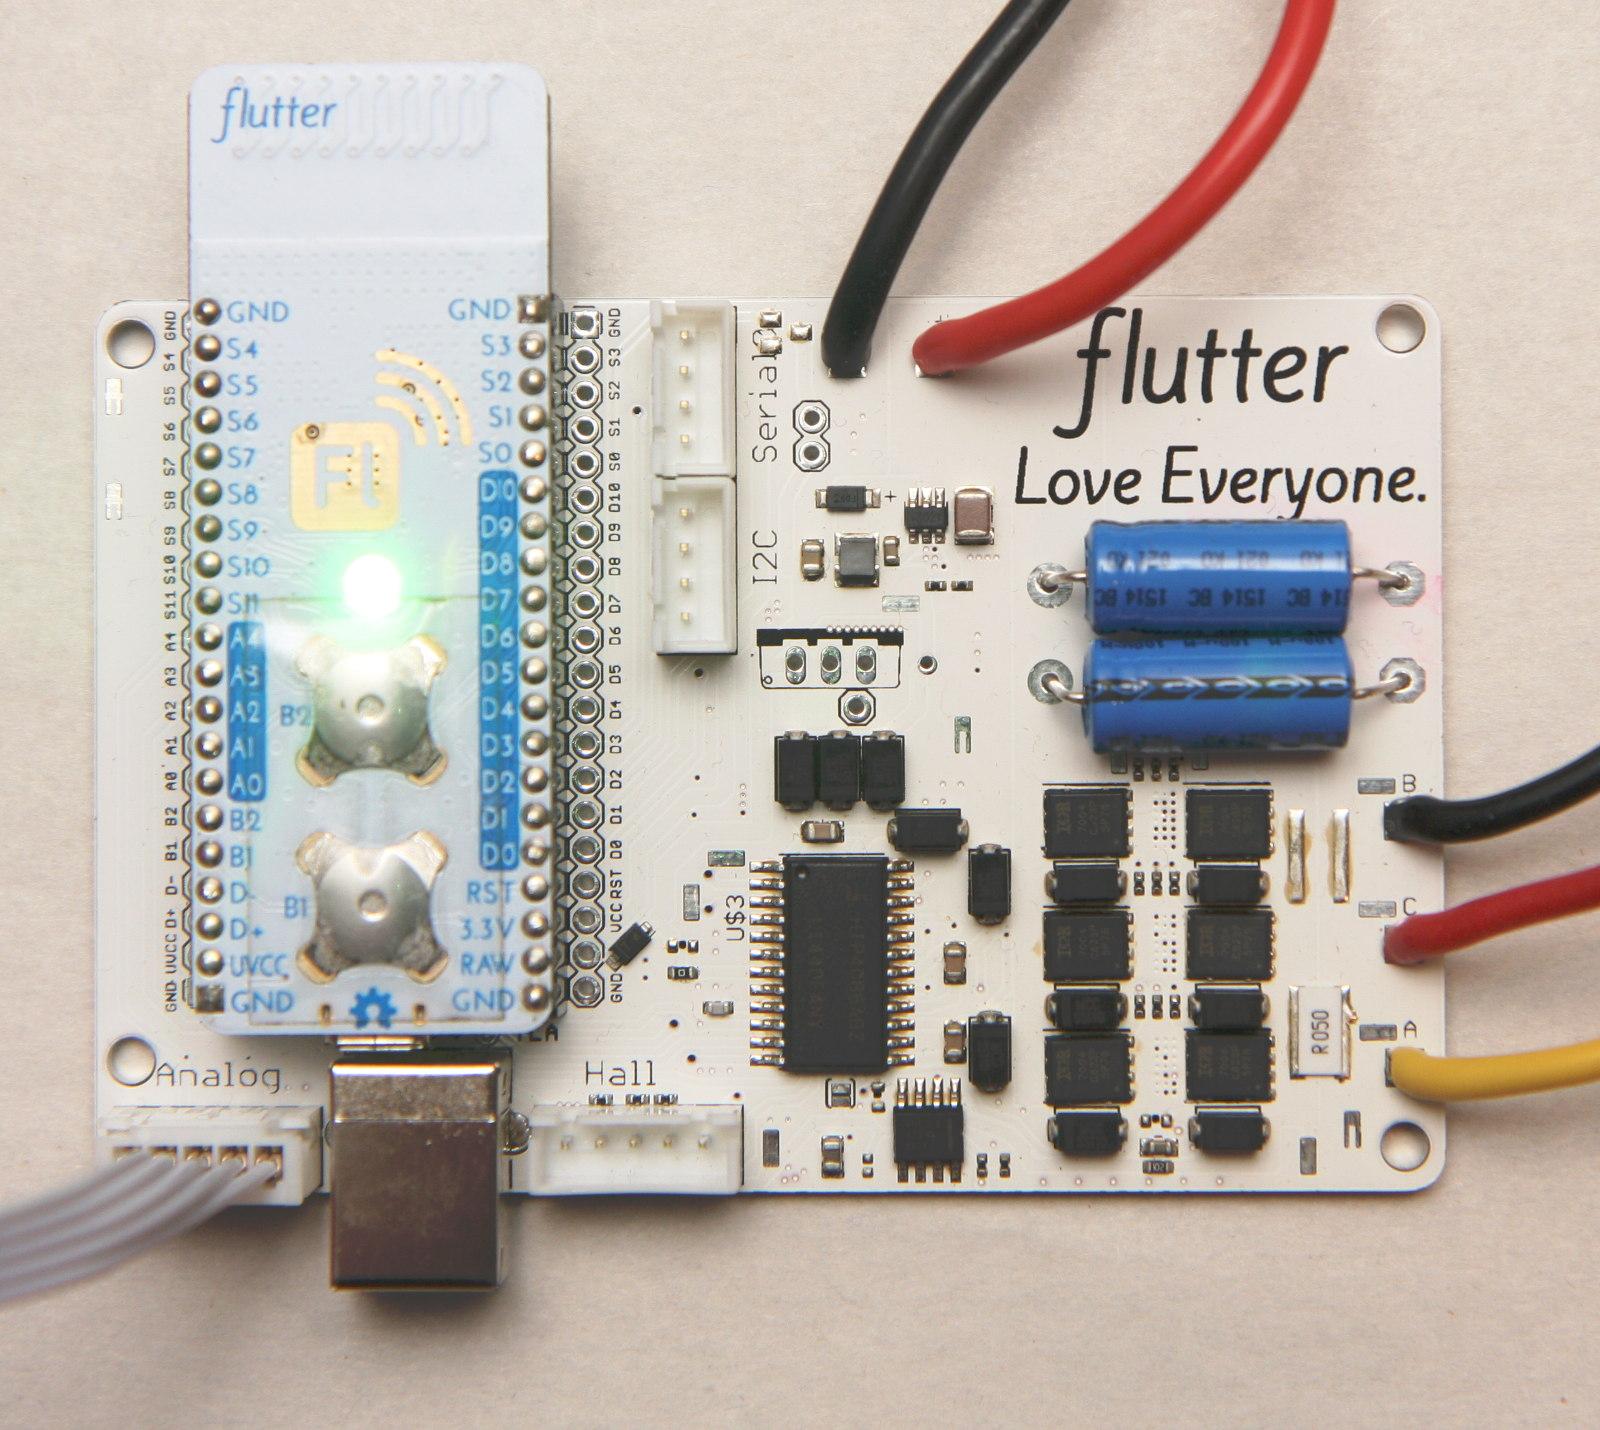 VESC mods for robotics use - machines - reboot love